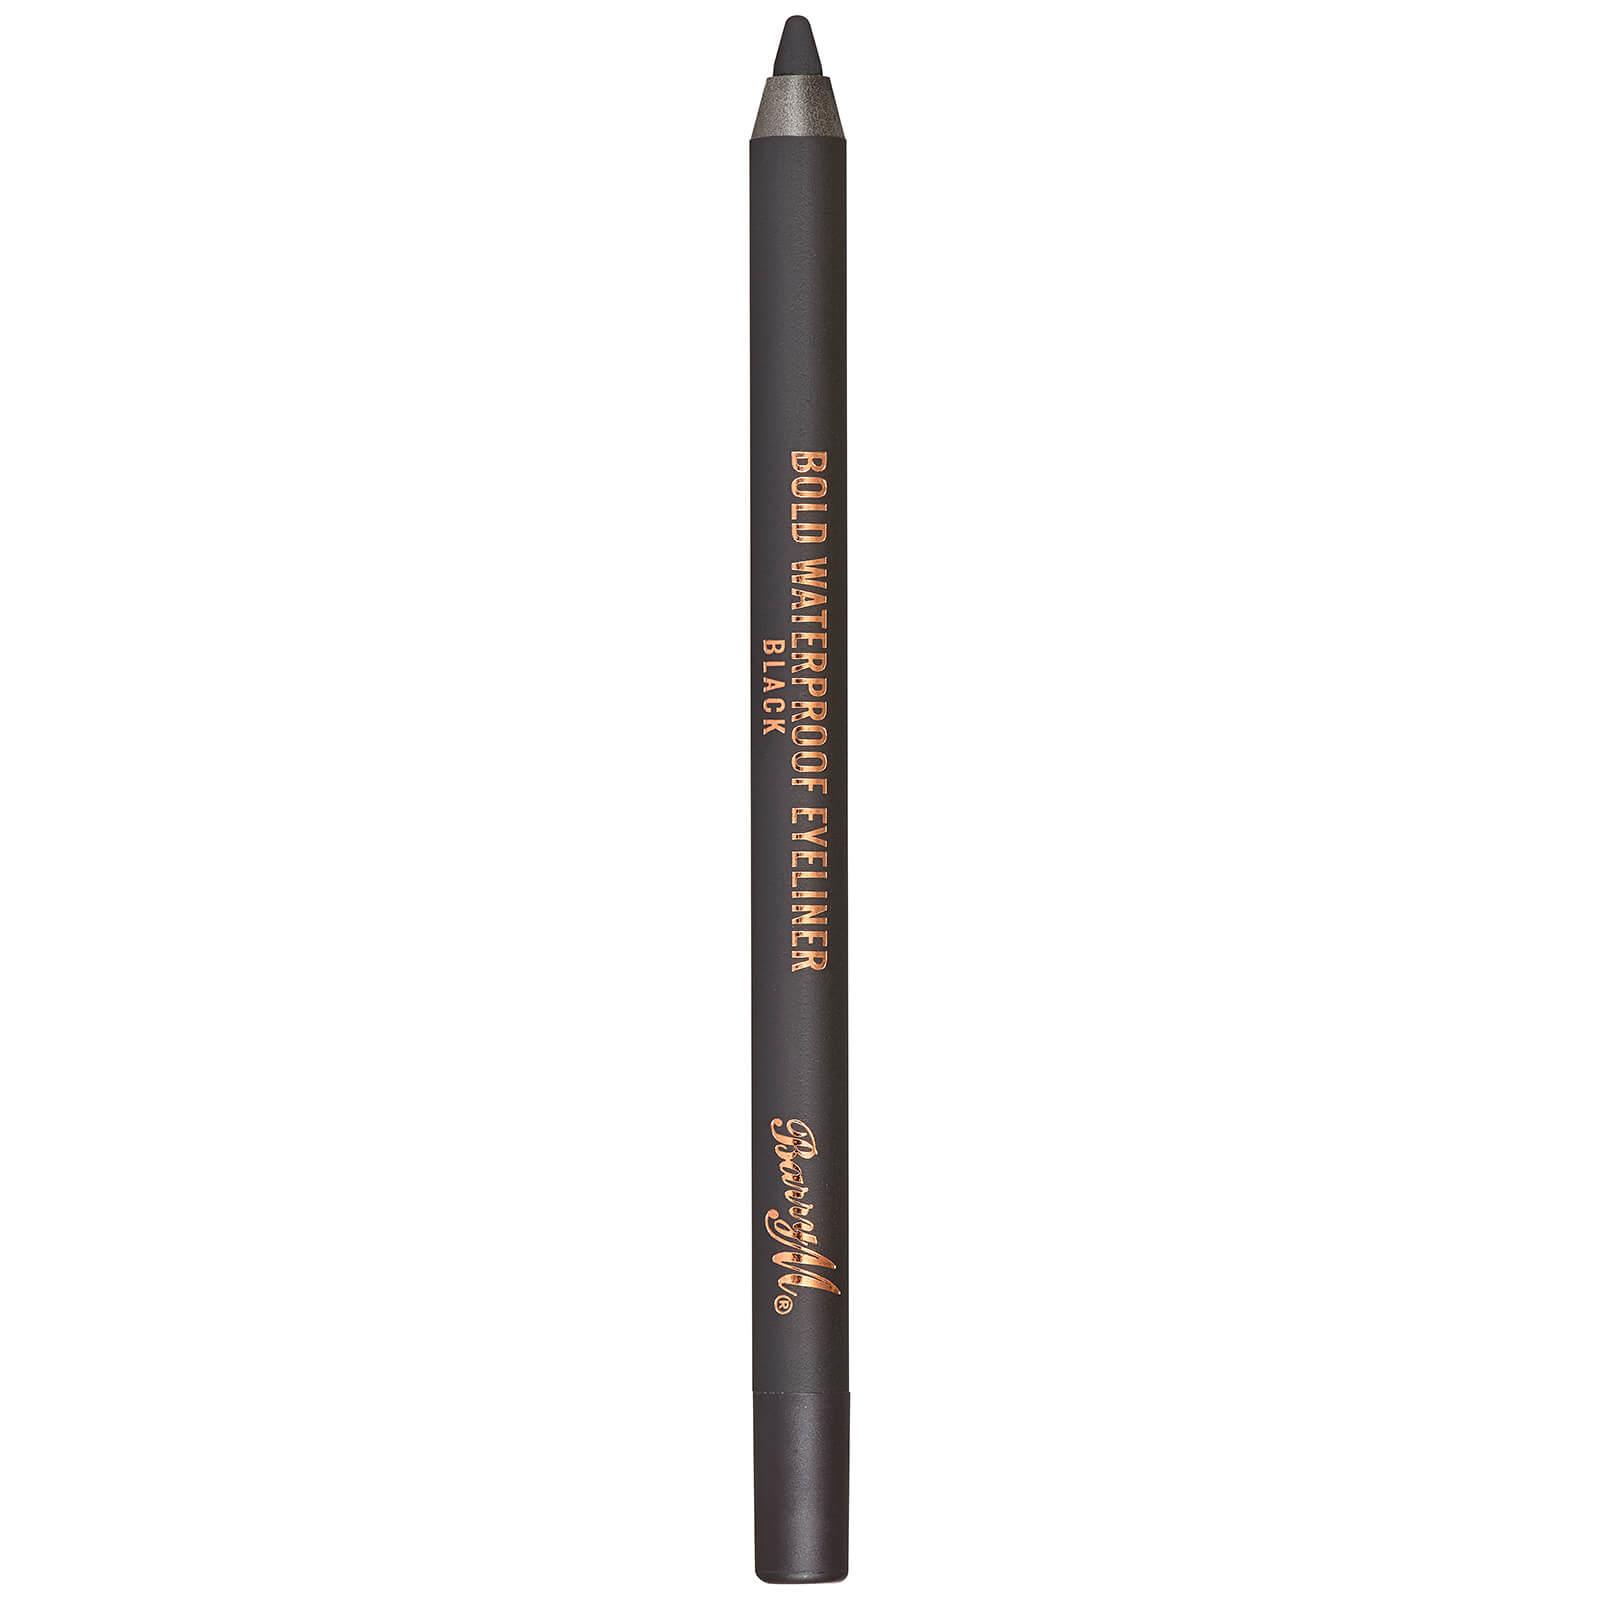 ec2178117a0 Barry M Cosmetics Bold Waterproof Eyeliner (Various Shades) | Free Shipping  | Lookfantastic